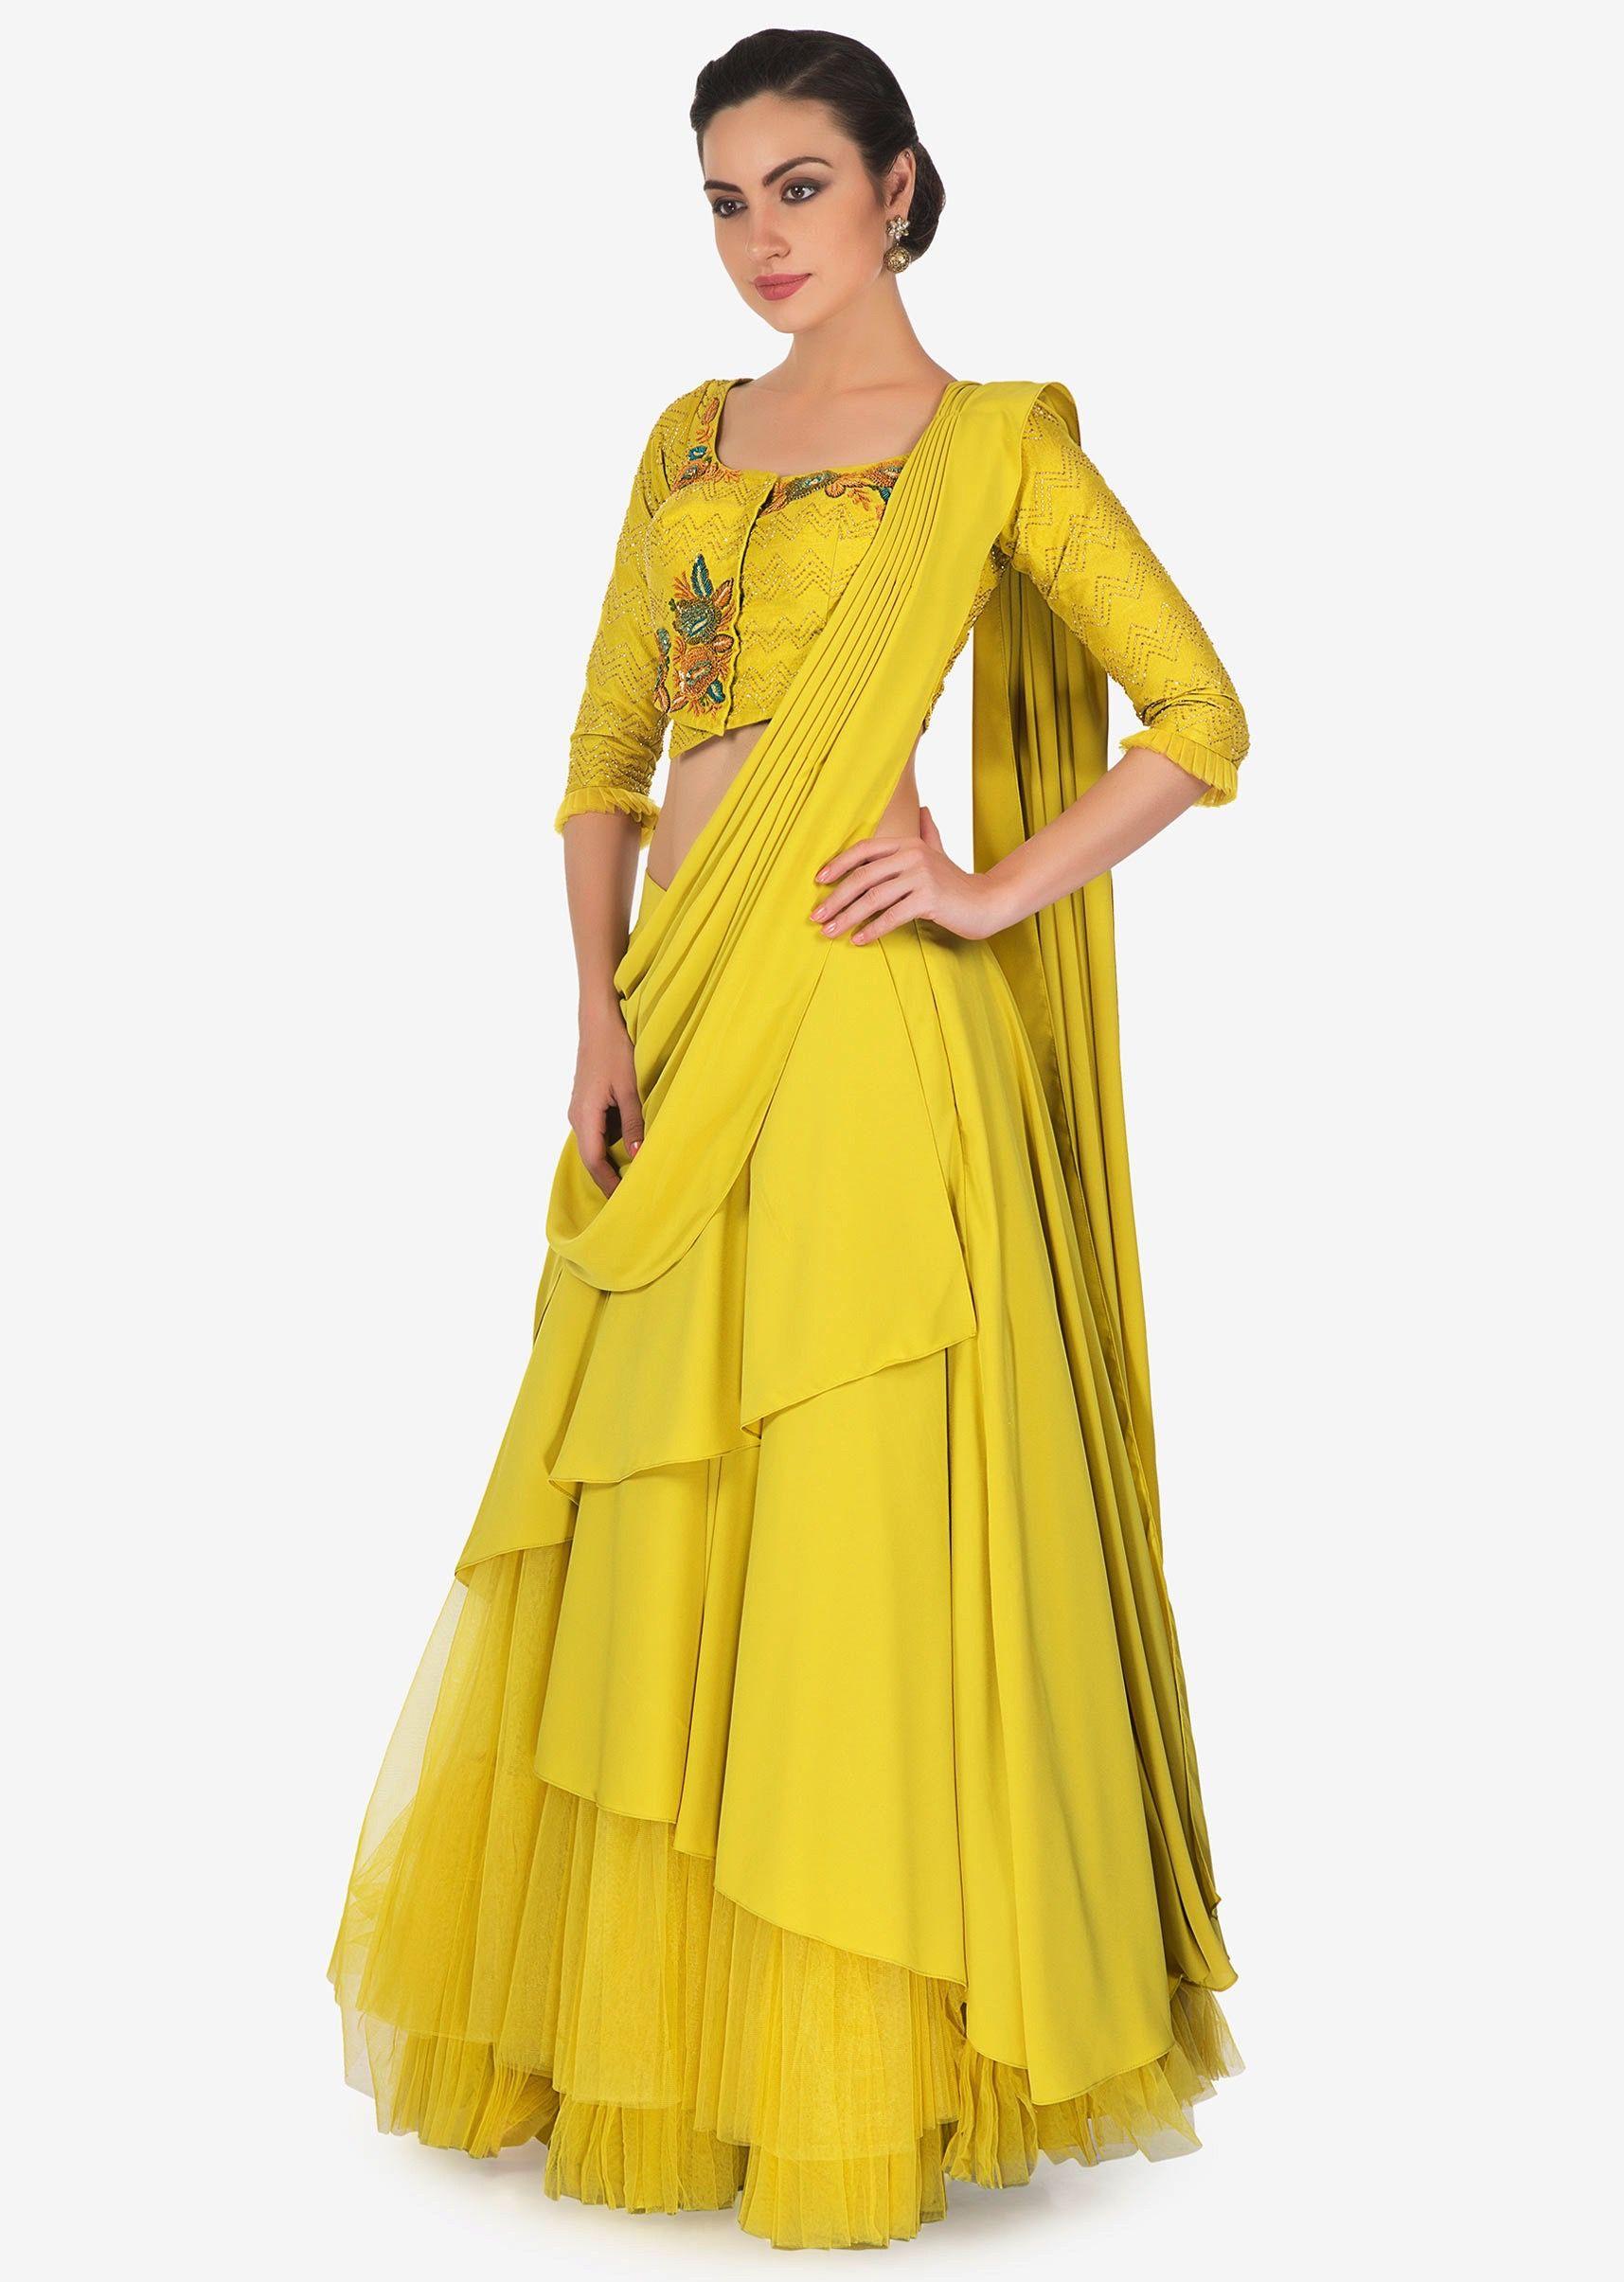 954c84ddaf7e4d Corn mustard multi layer lehenga with raw silk blouse and pre stitch  dupatta only on Kalki